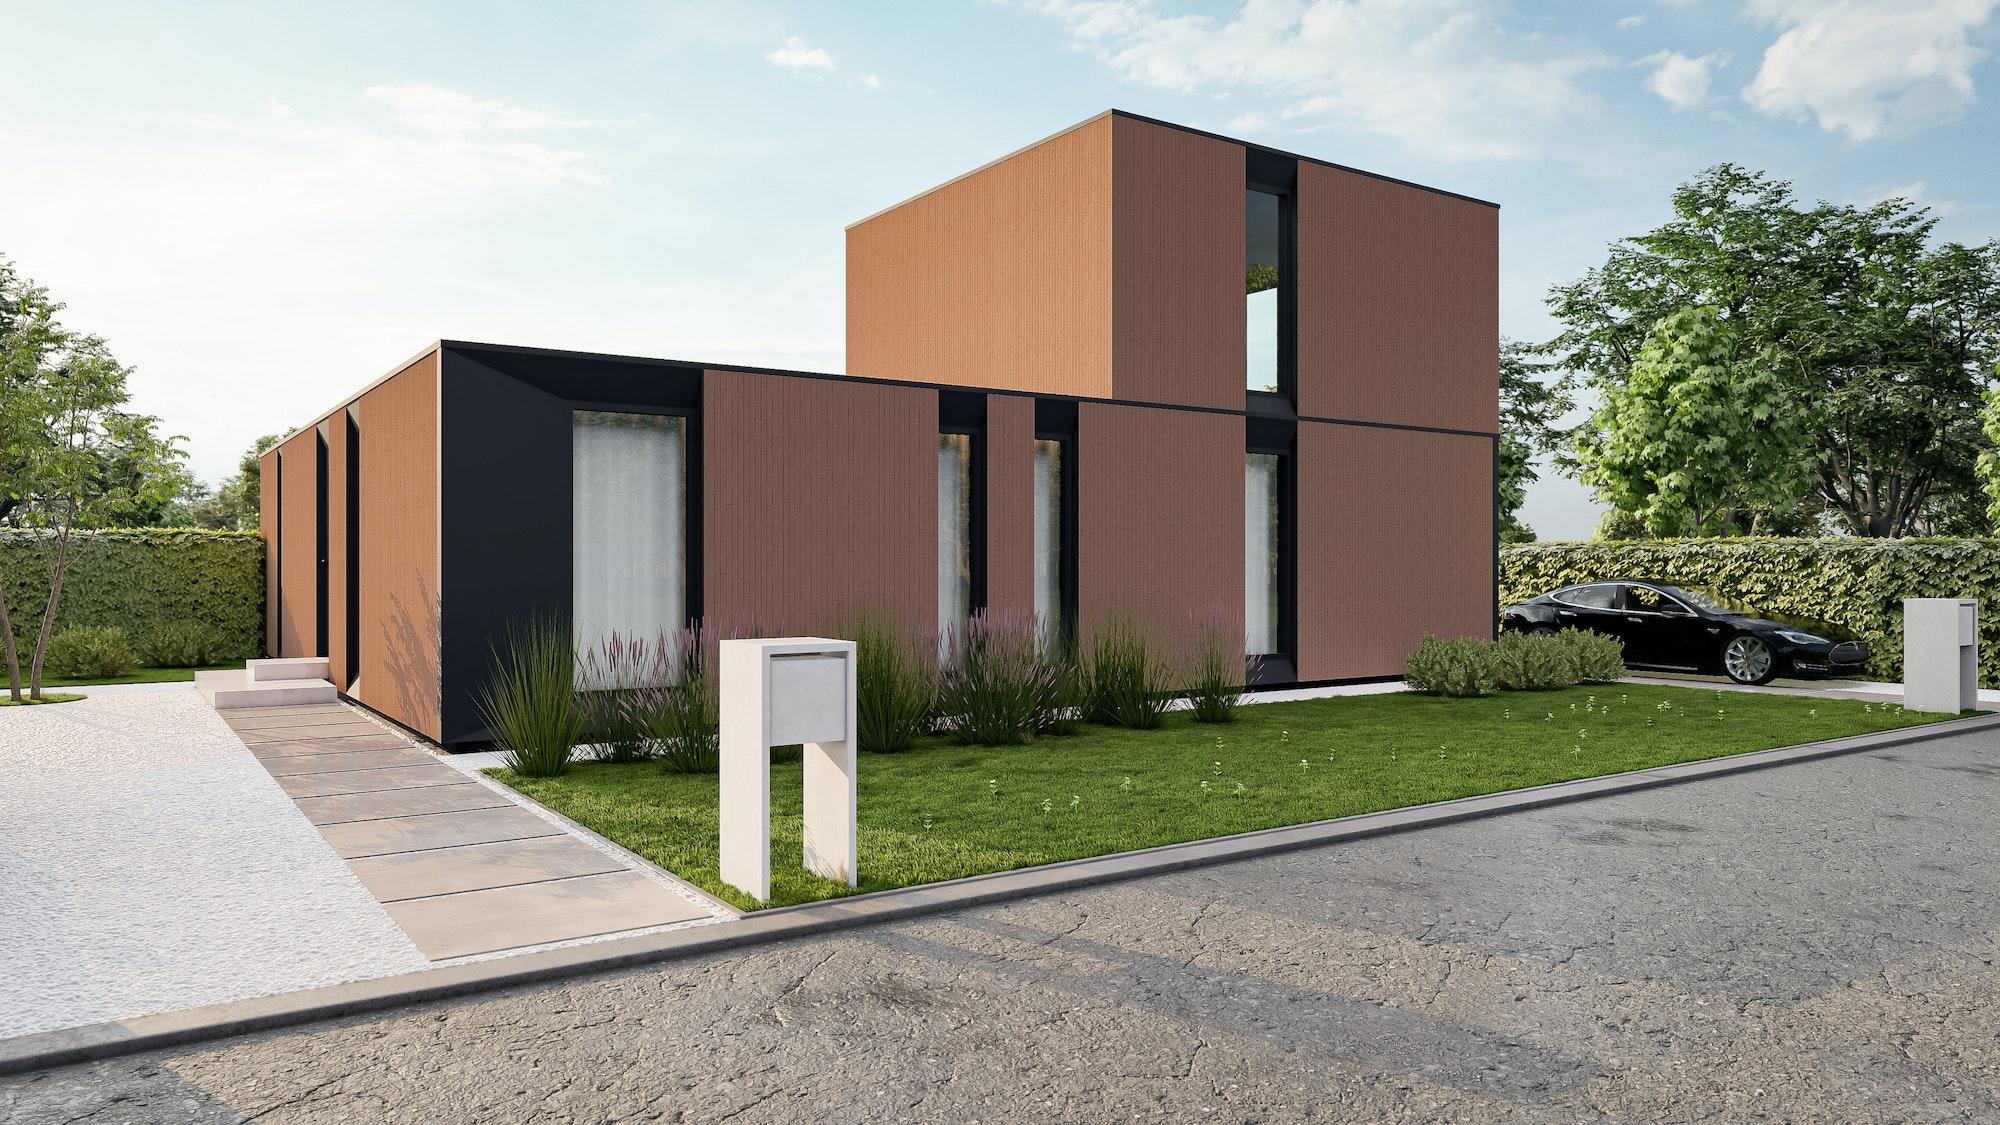 Skilpod sleutel-op-de-deur houtskeletbouw woningen in Balen